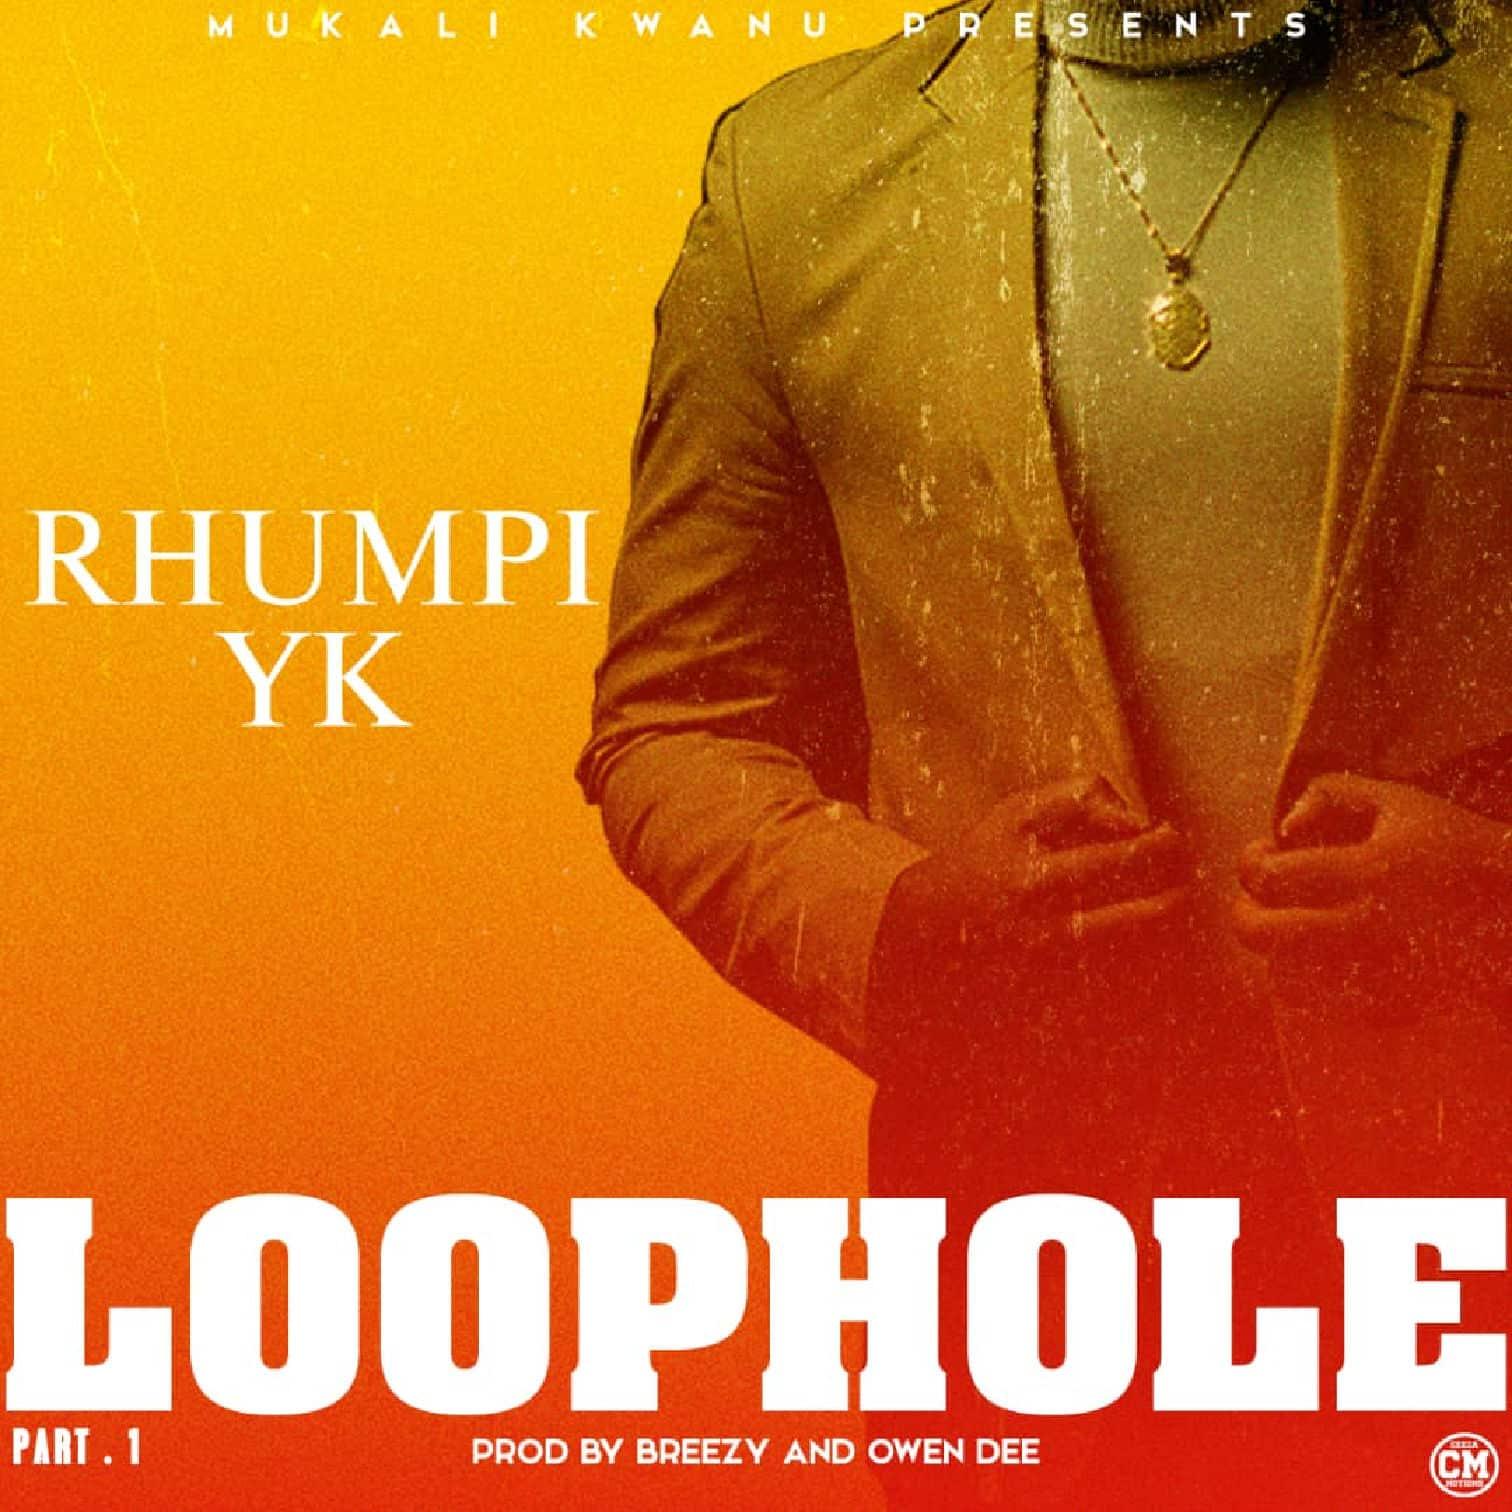 Rhumpi YK Loophole Part 1